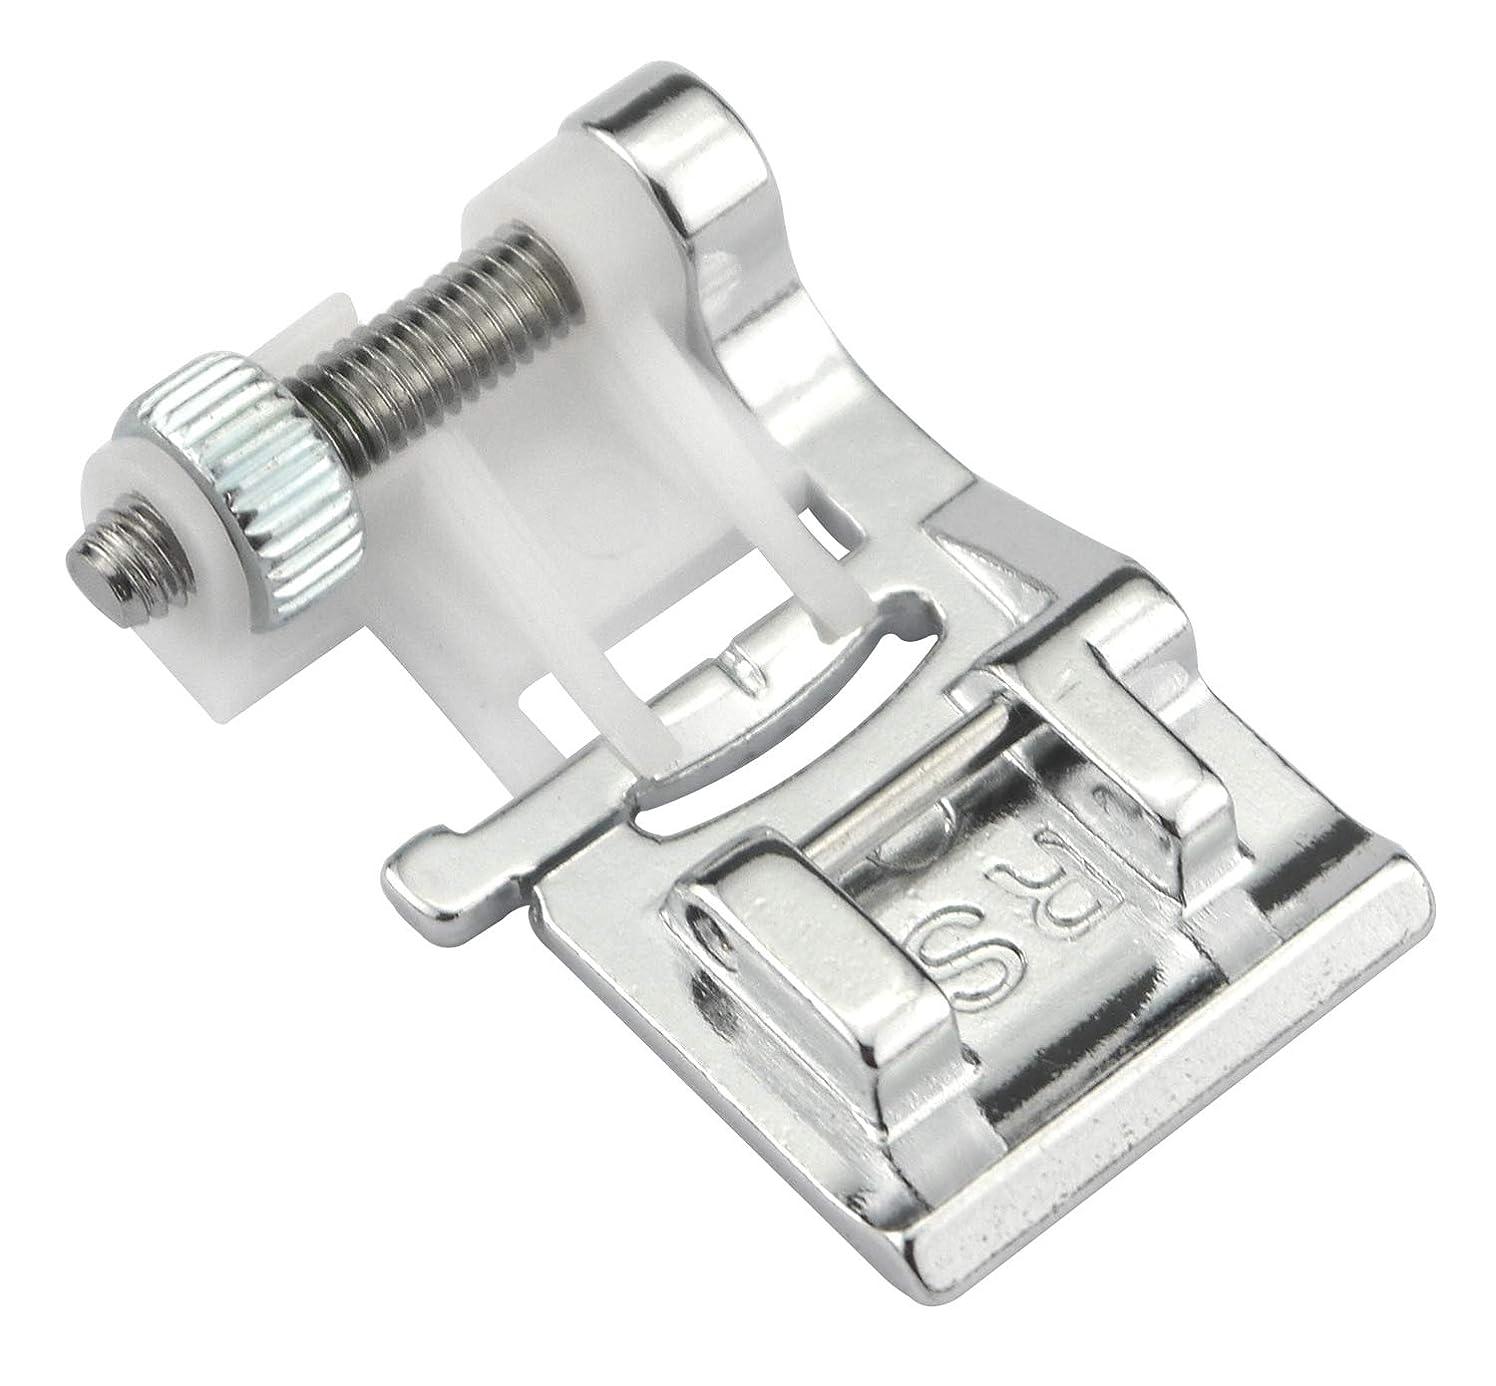 DREAMSTITCH 202090009 Snap On Ribbon/Sequin Presser Foot for Janome,Elna Sewing Machine ALT : 202090205-202090009